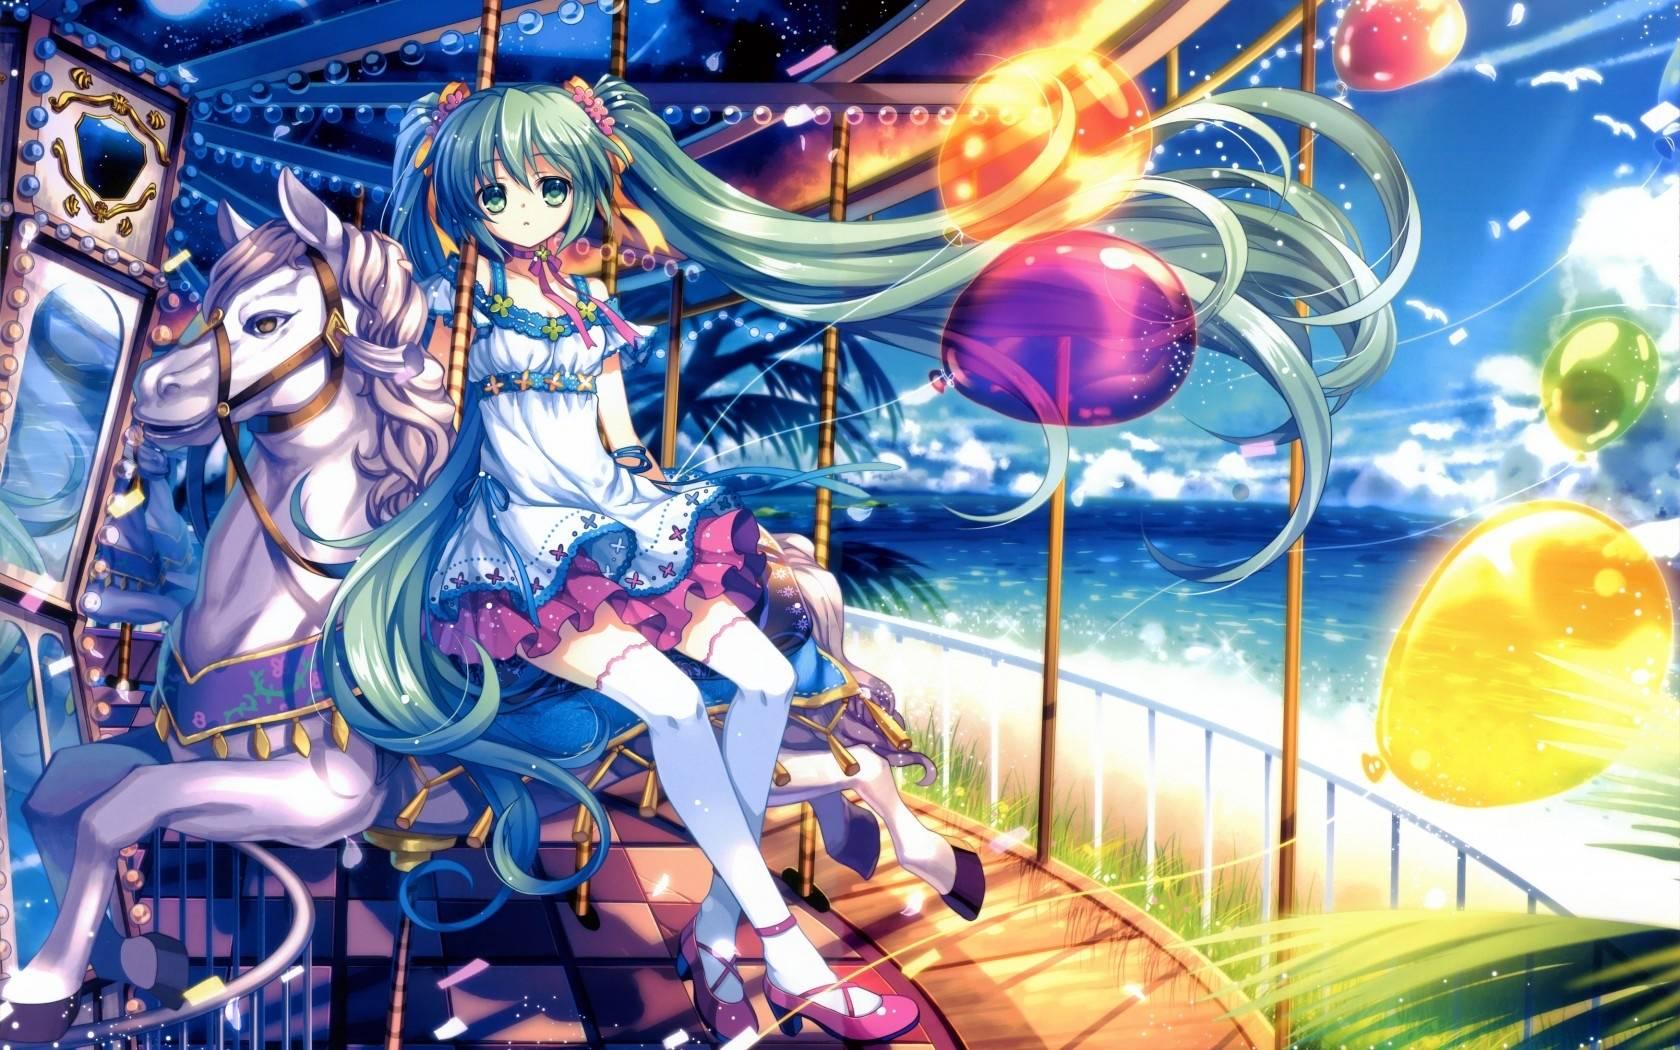 Girl in merry go round   Anime Manga Wallpaper 1680x1050